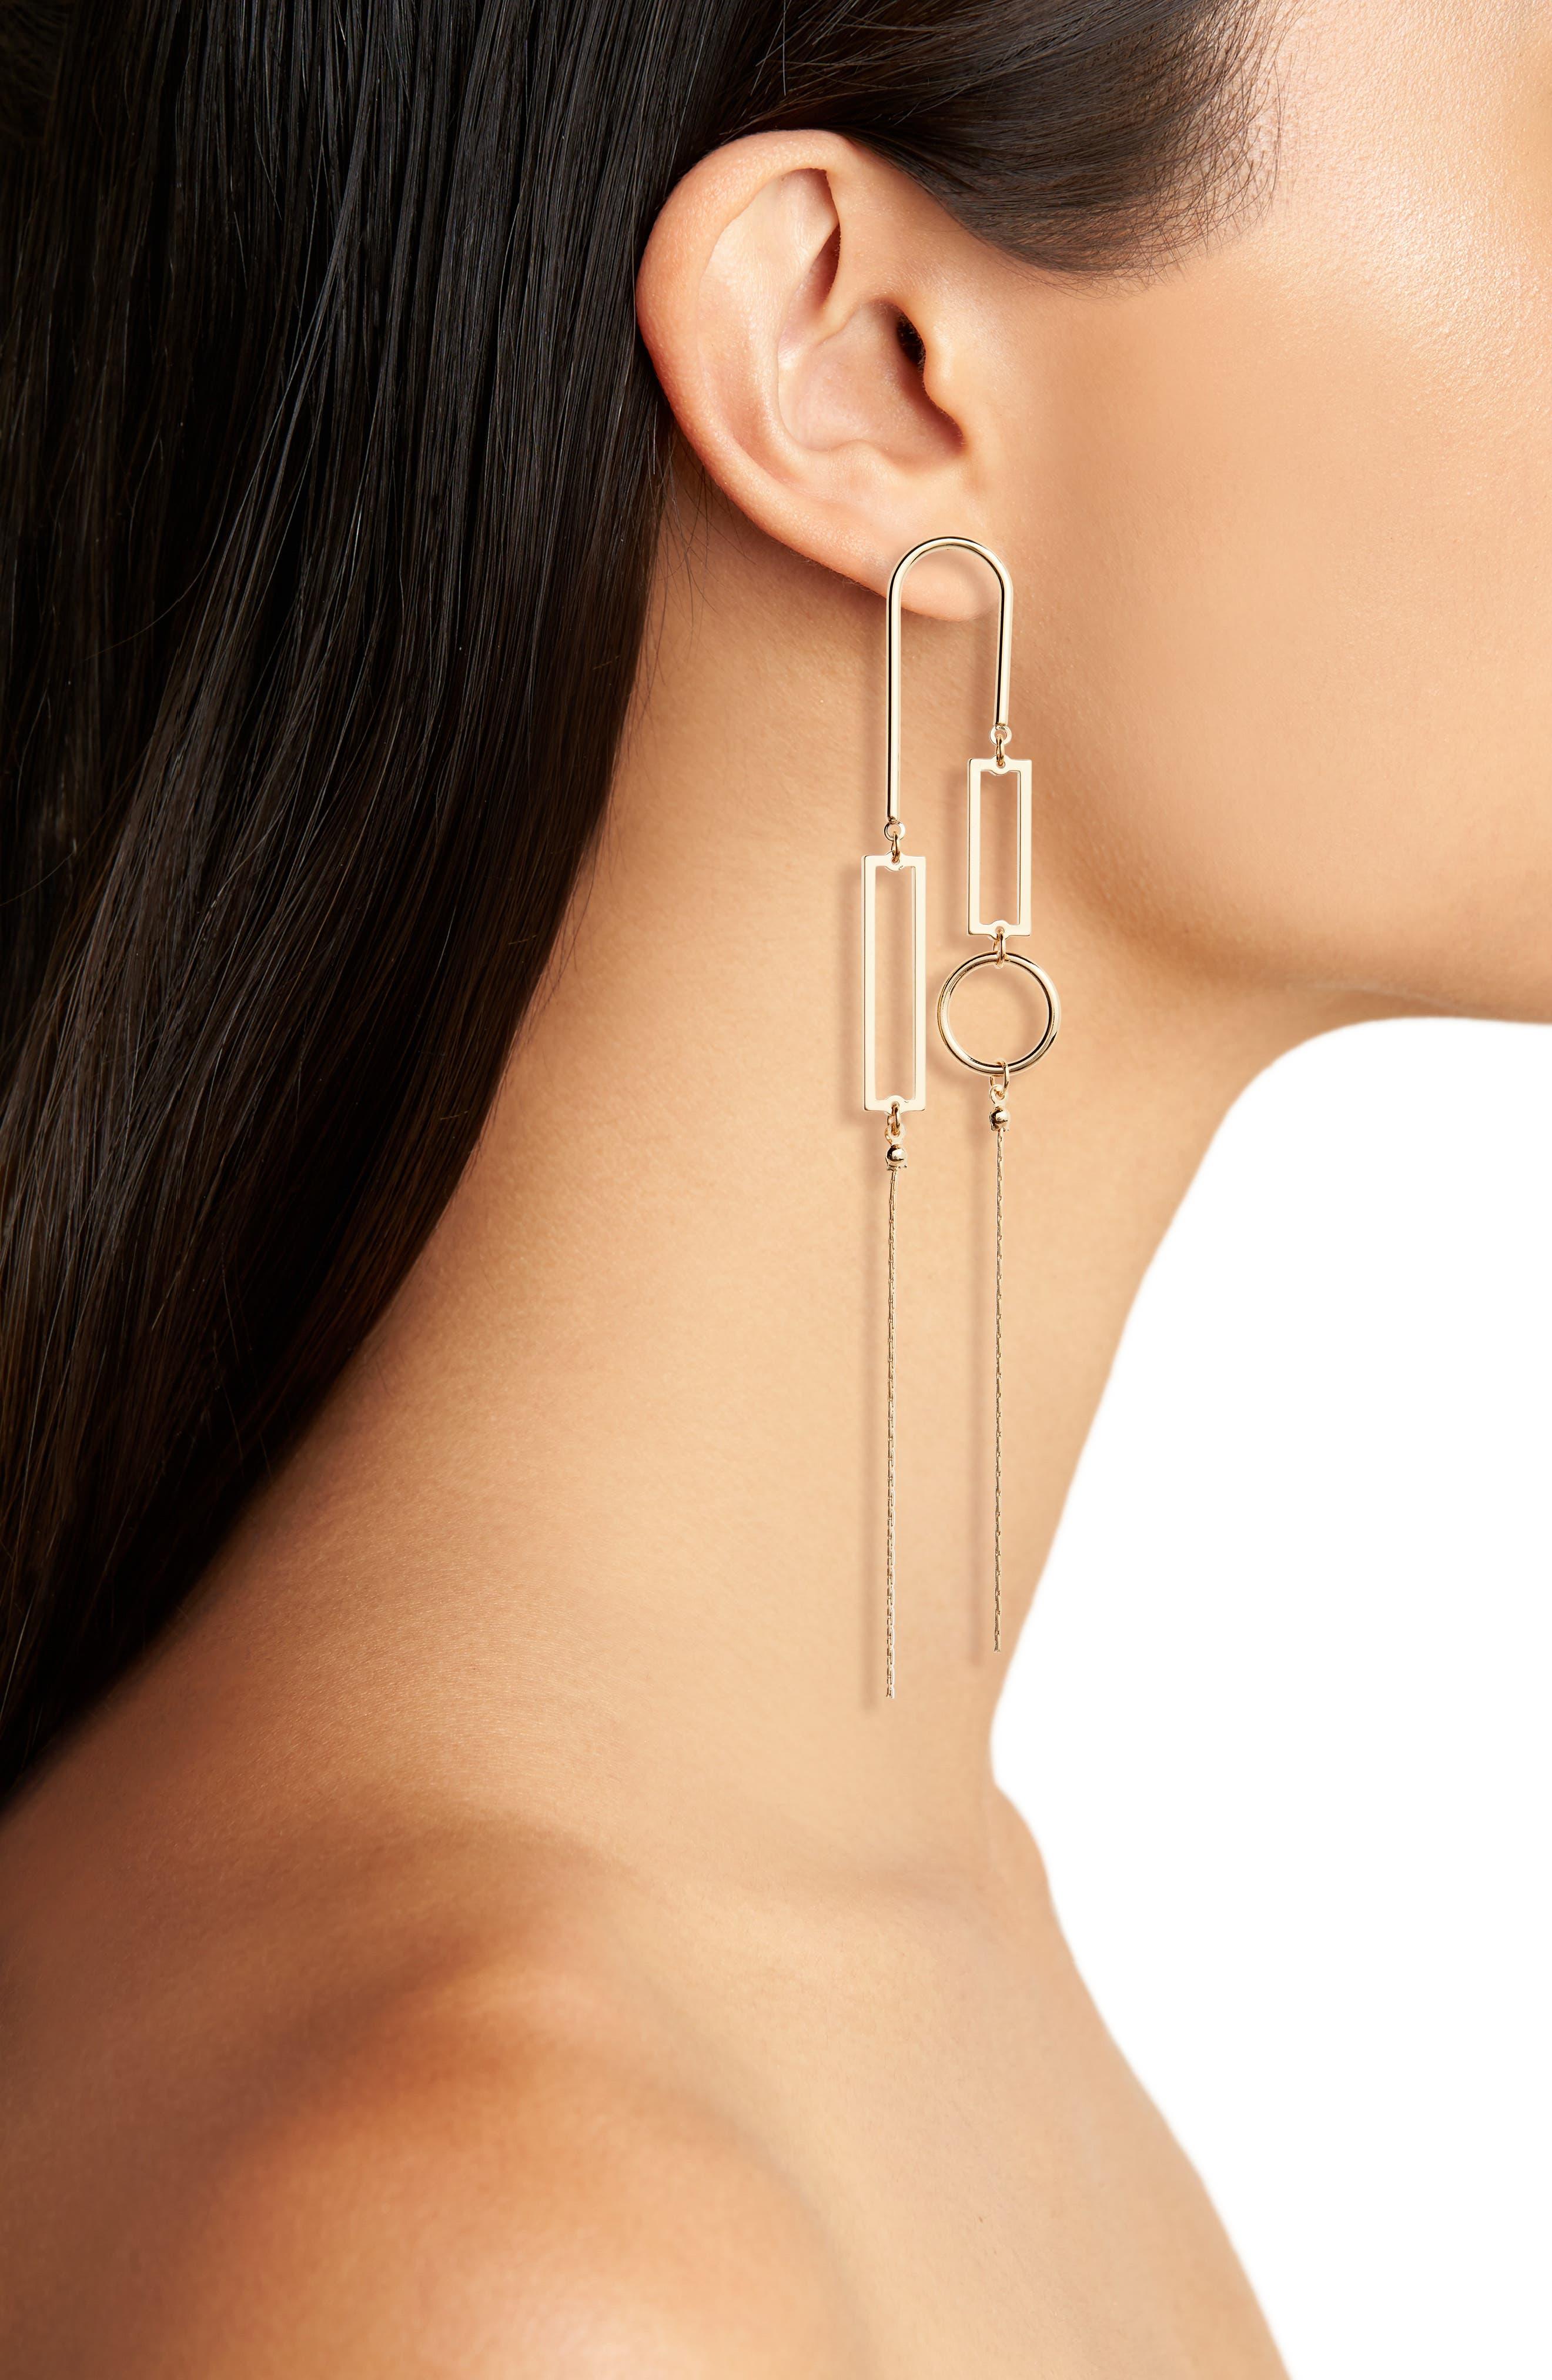 Geometric Mobile Earrings,                             Alternate thumbnail 2, color,                             GOLD